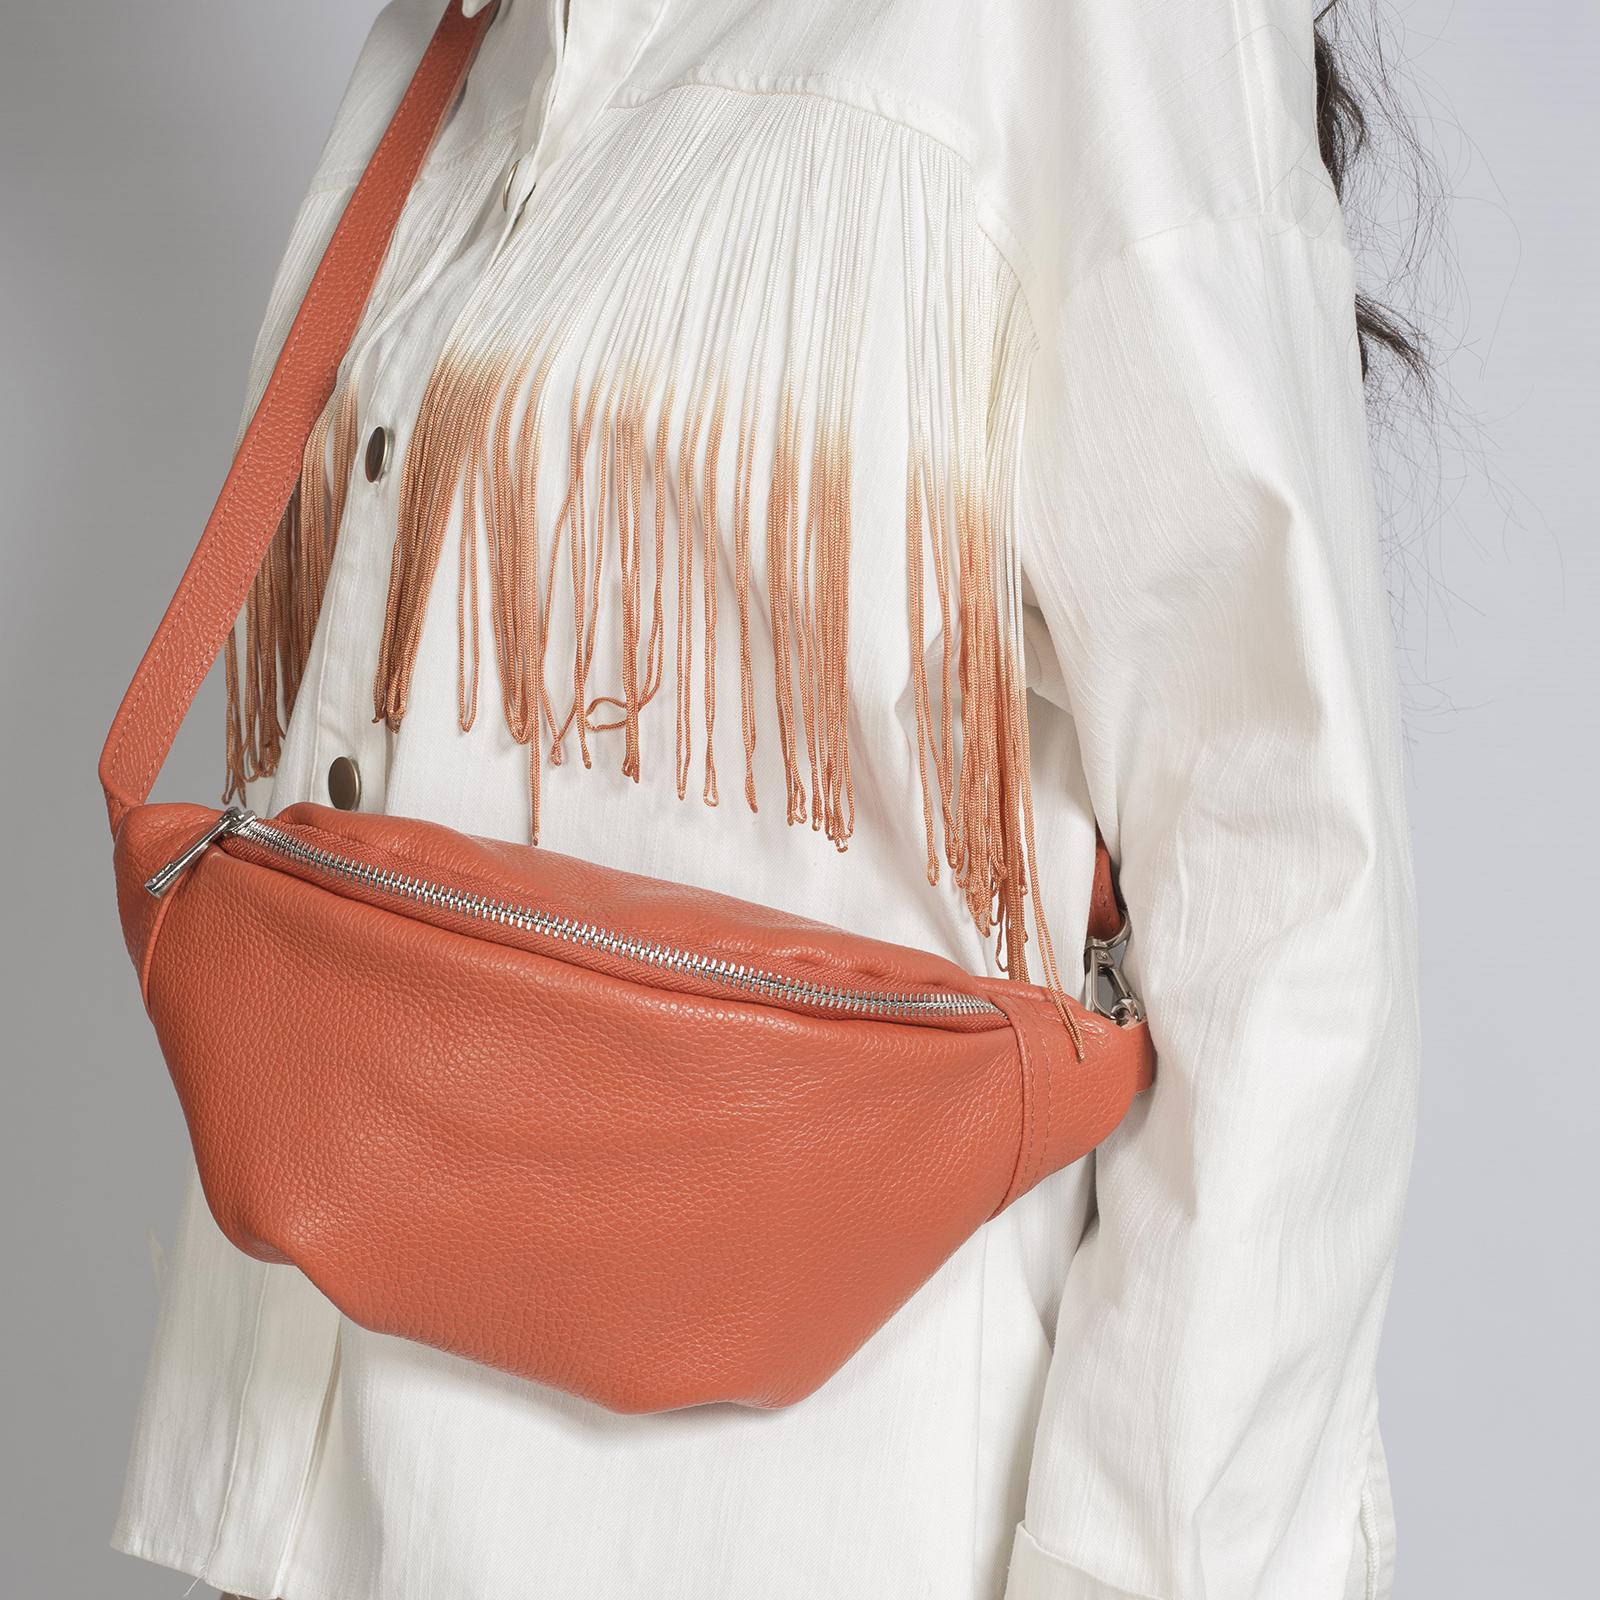 Fanny pack, UNO, Missy (охра)